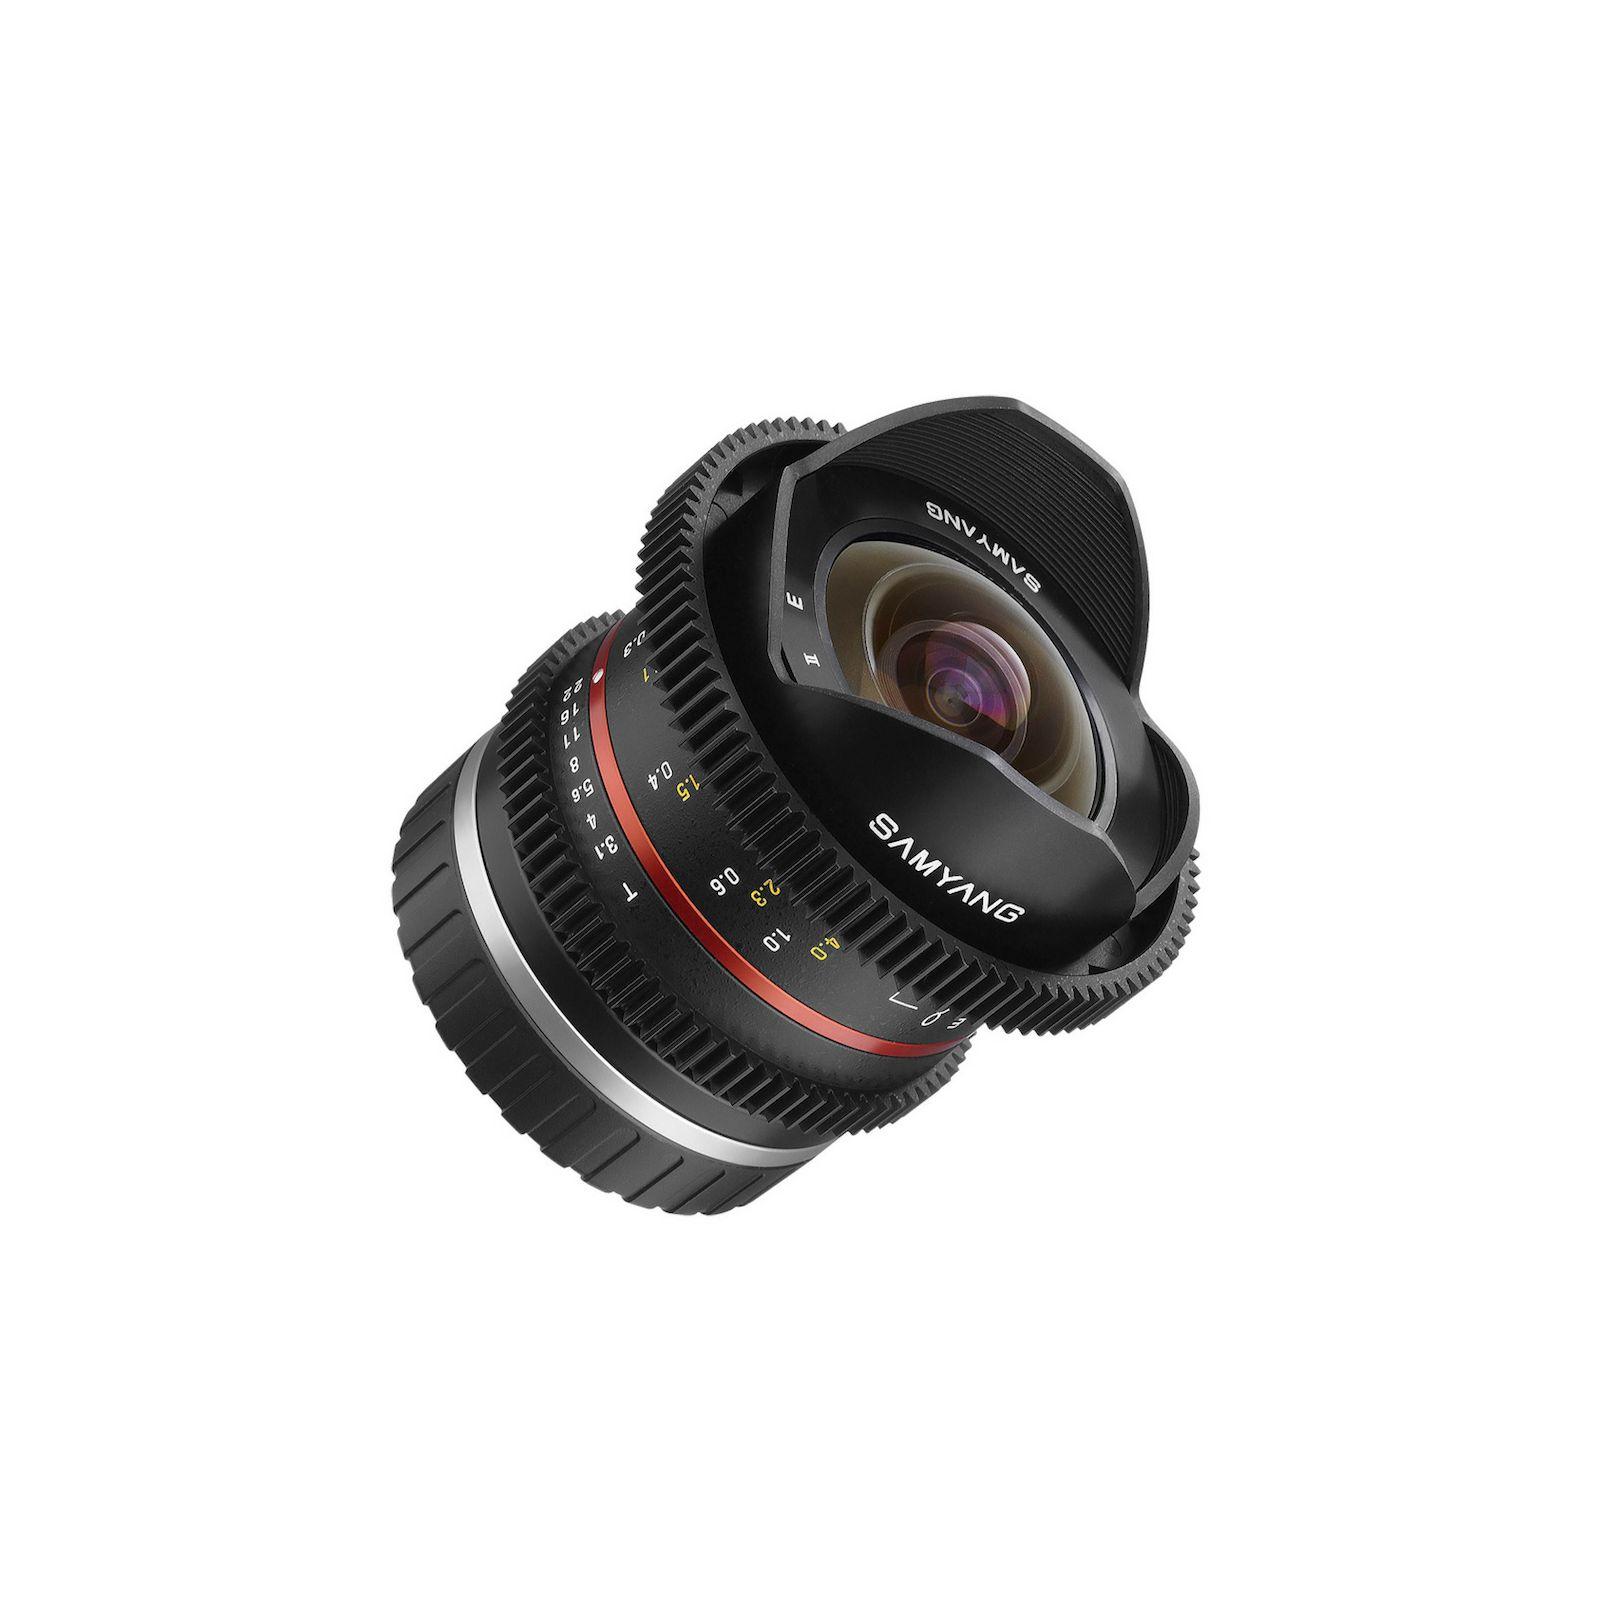 Samyang 8mm T3.1 VDSLR Samsung NX